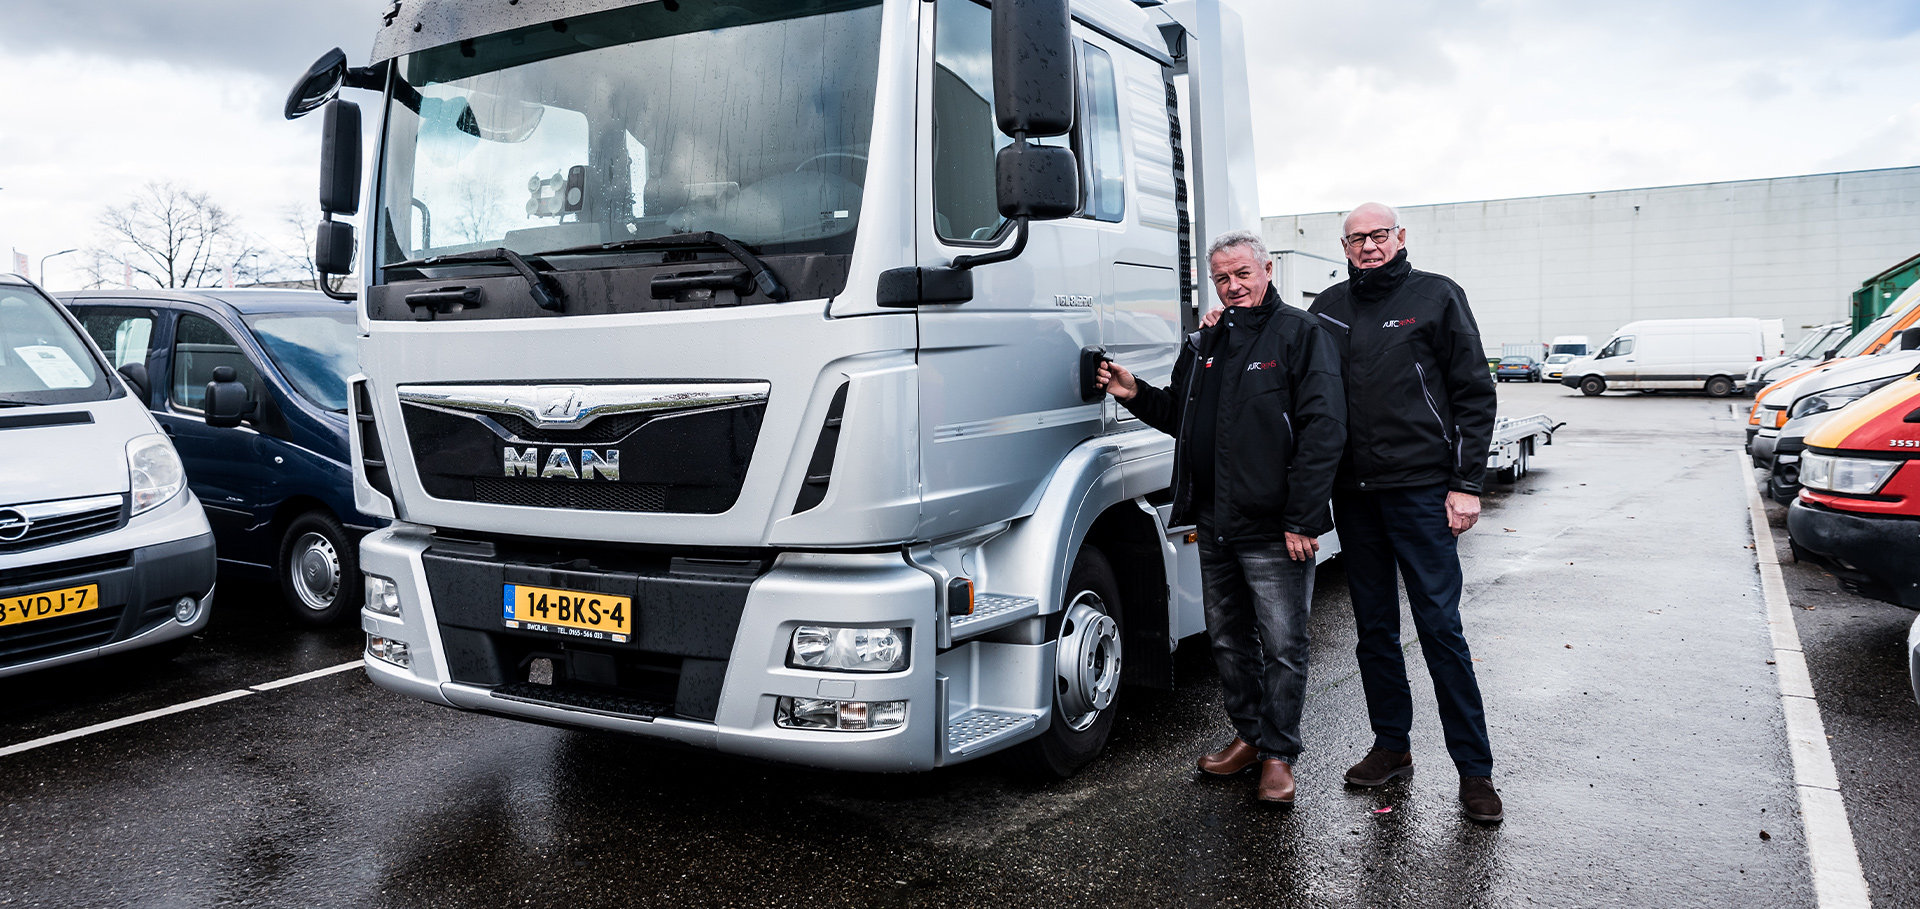 Haal- en brengservice Roosendaal Auto Rens